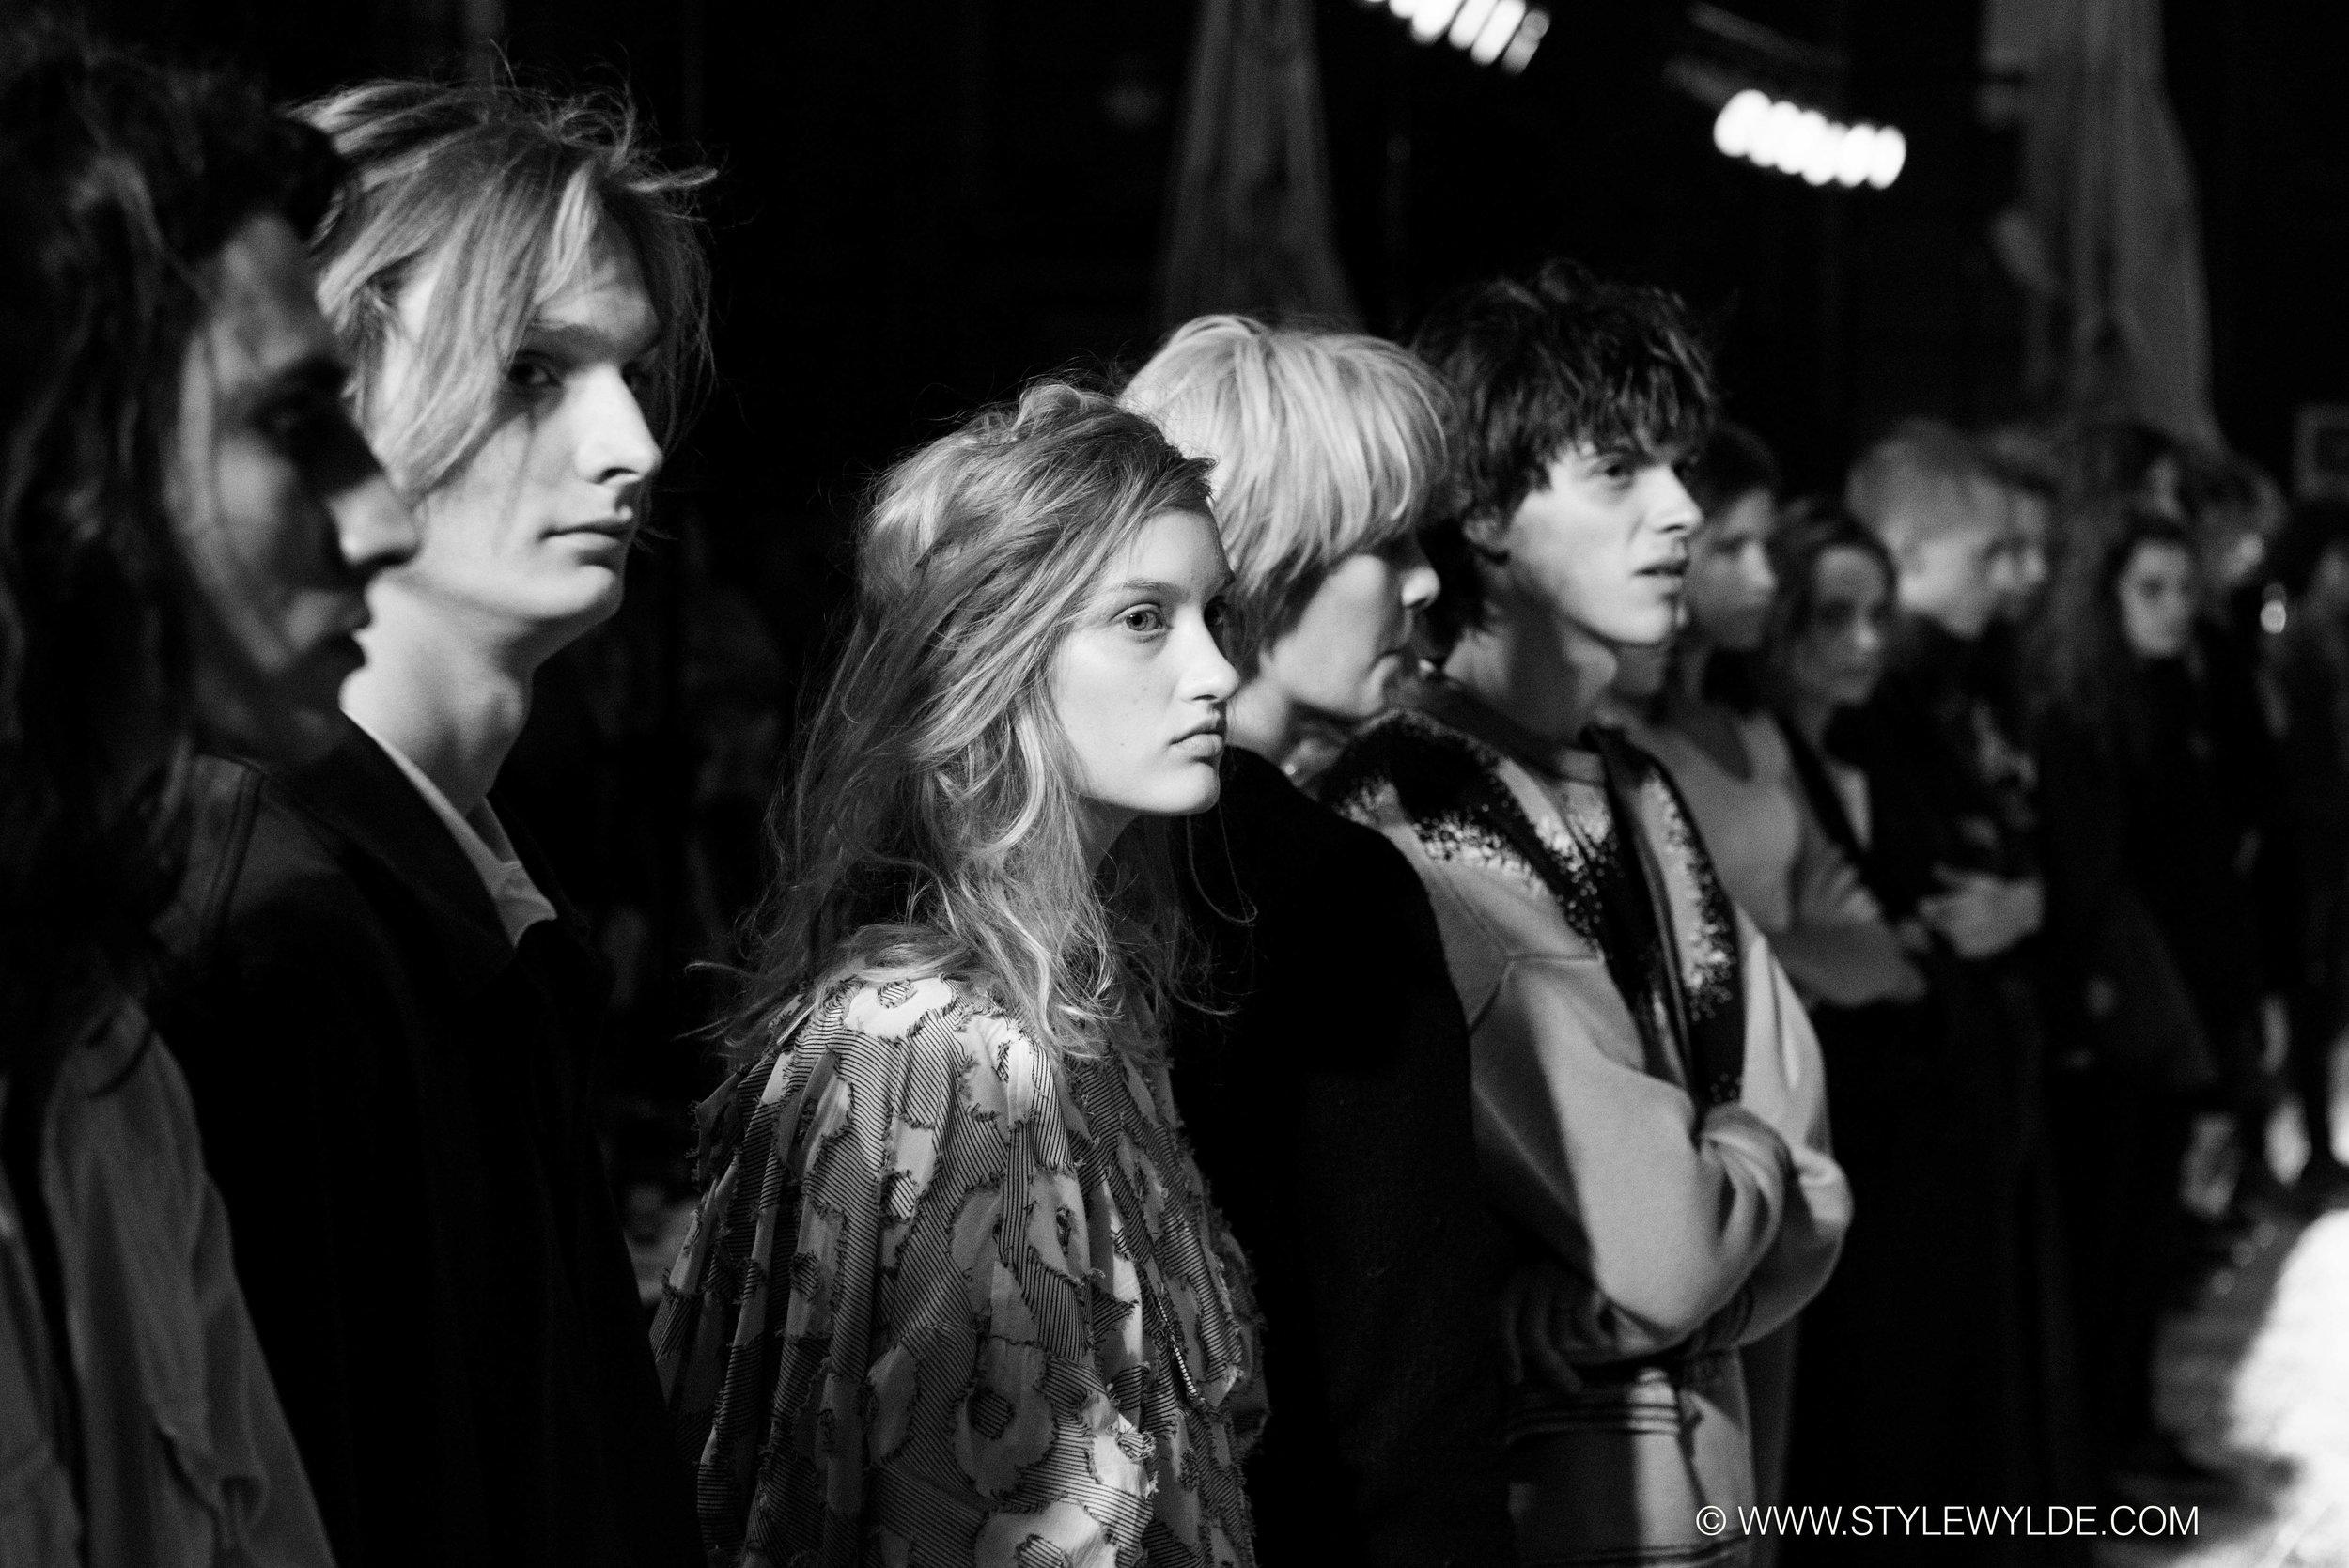 CynthiaHopeAnderson_Vibskov_SS18_Backstage Backstage_Eli-4.jpg